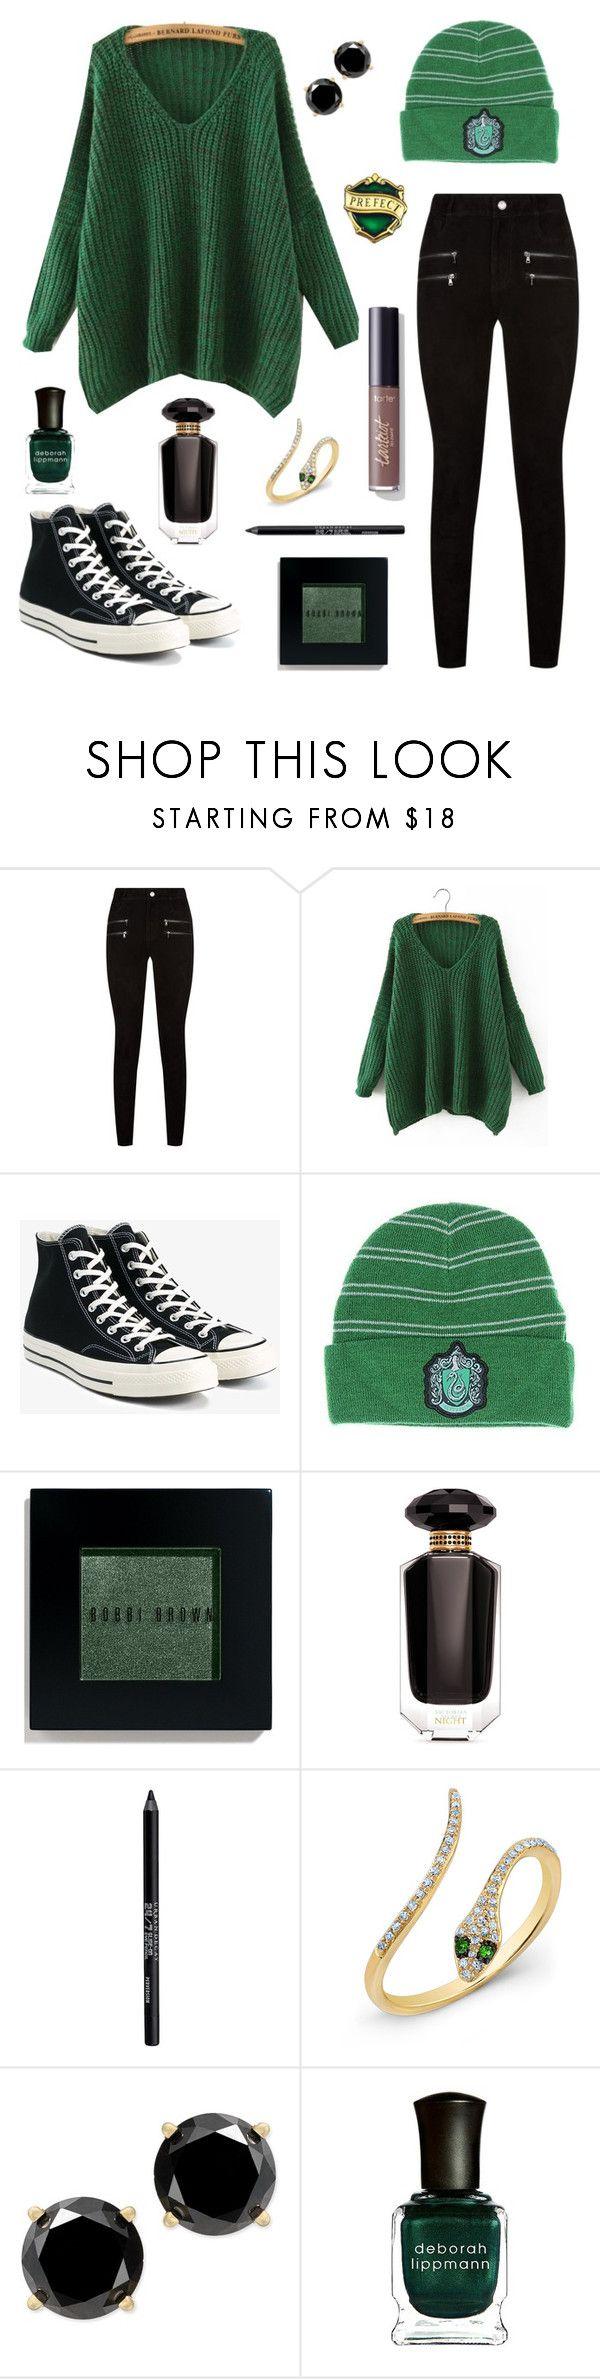 Best 25 Harry Potter Clothing Ideas On Pinterest Harry